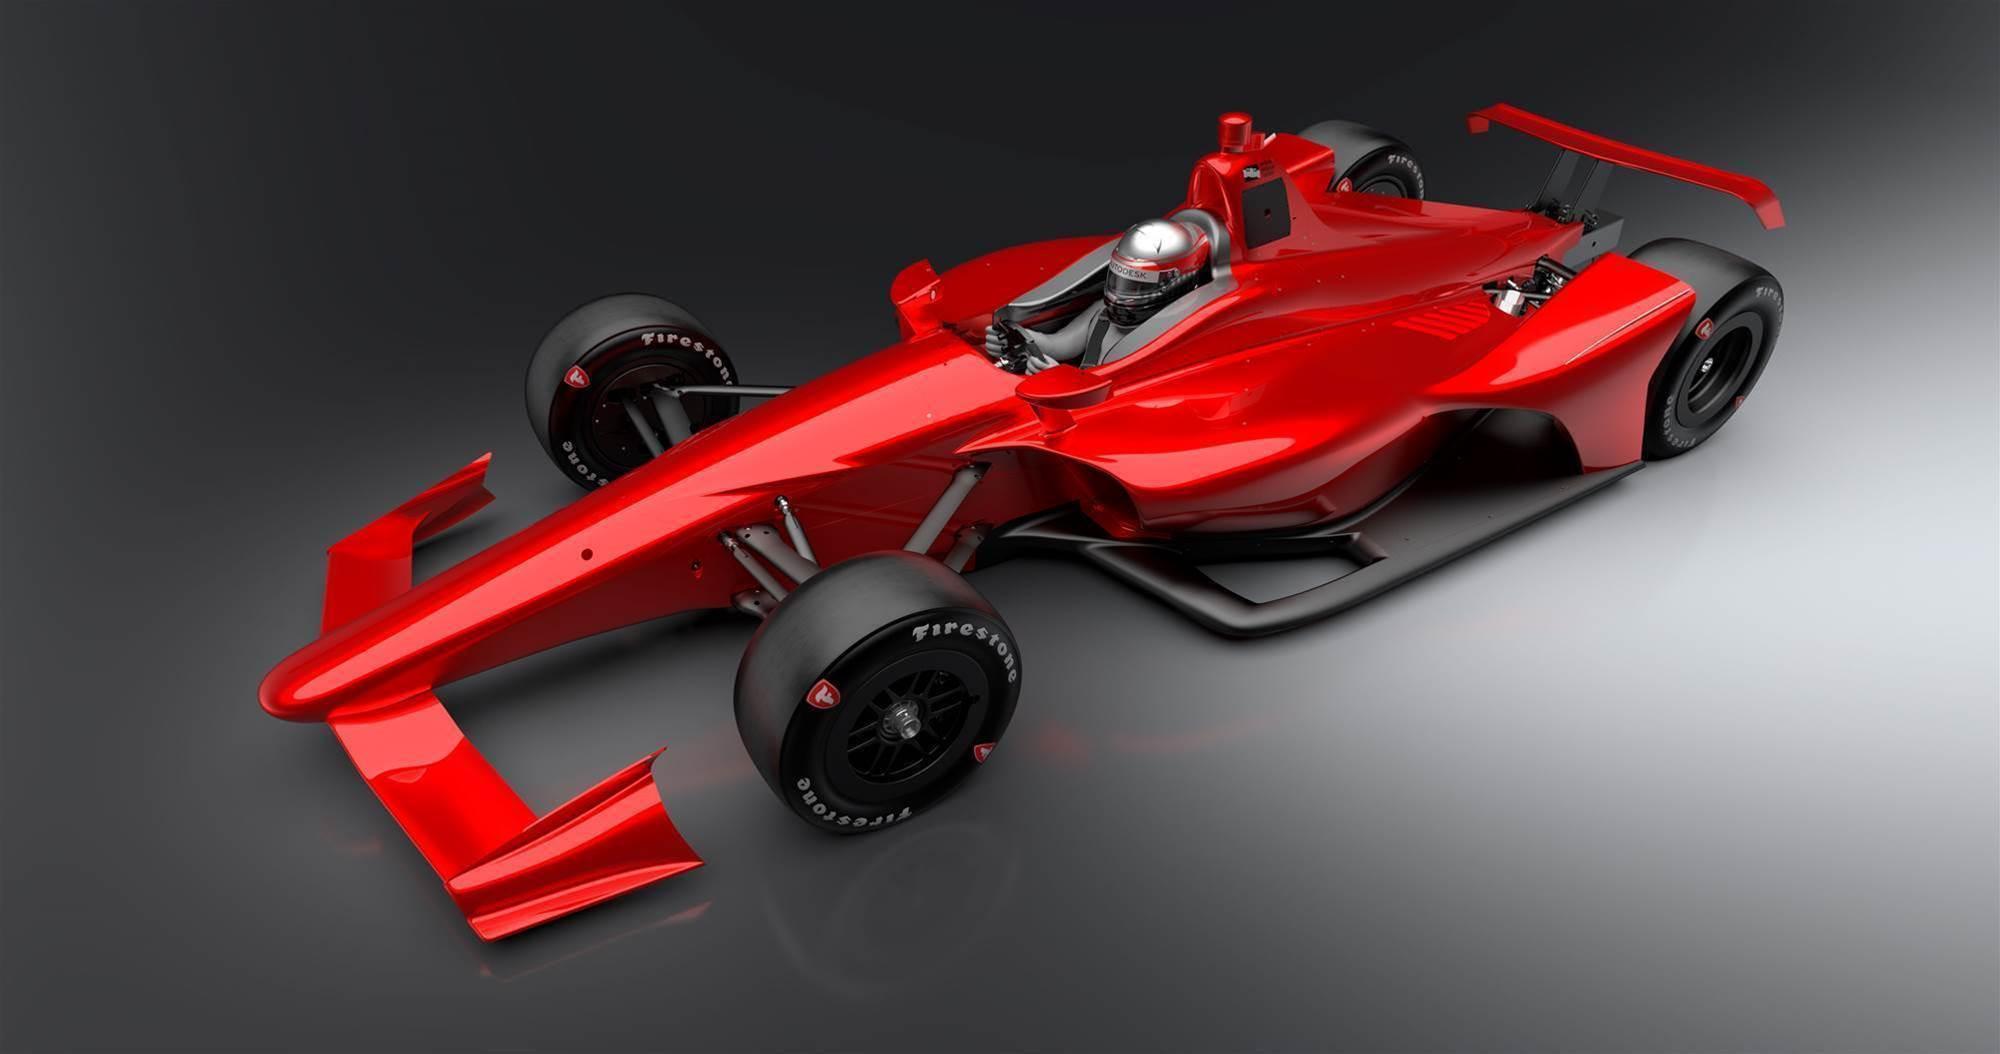 New Indycar aero kit unveiled